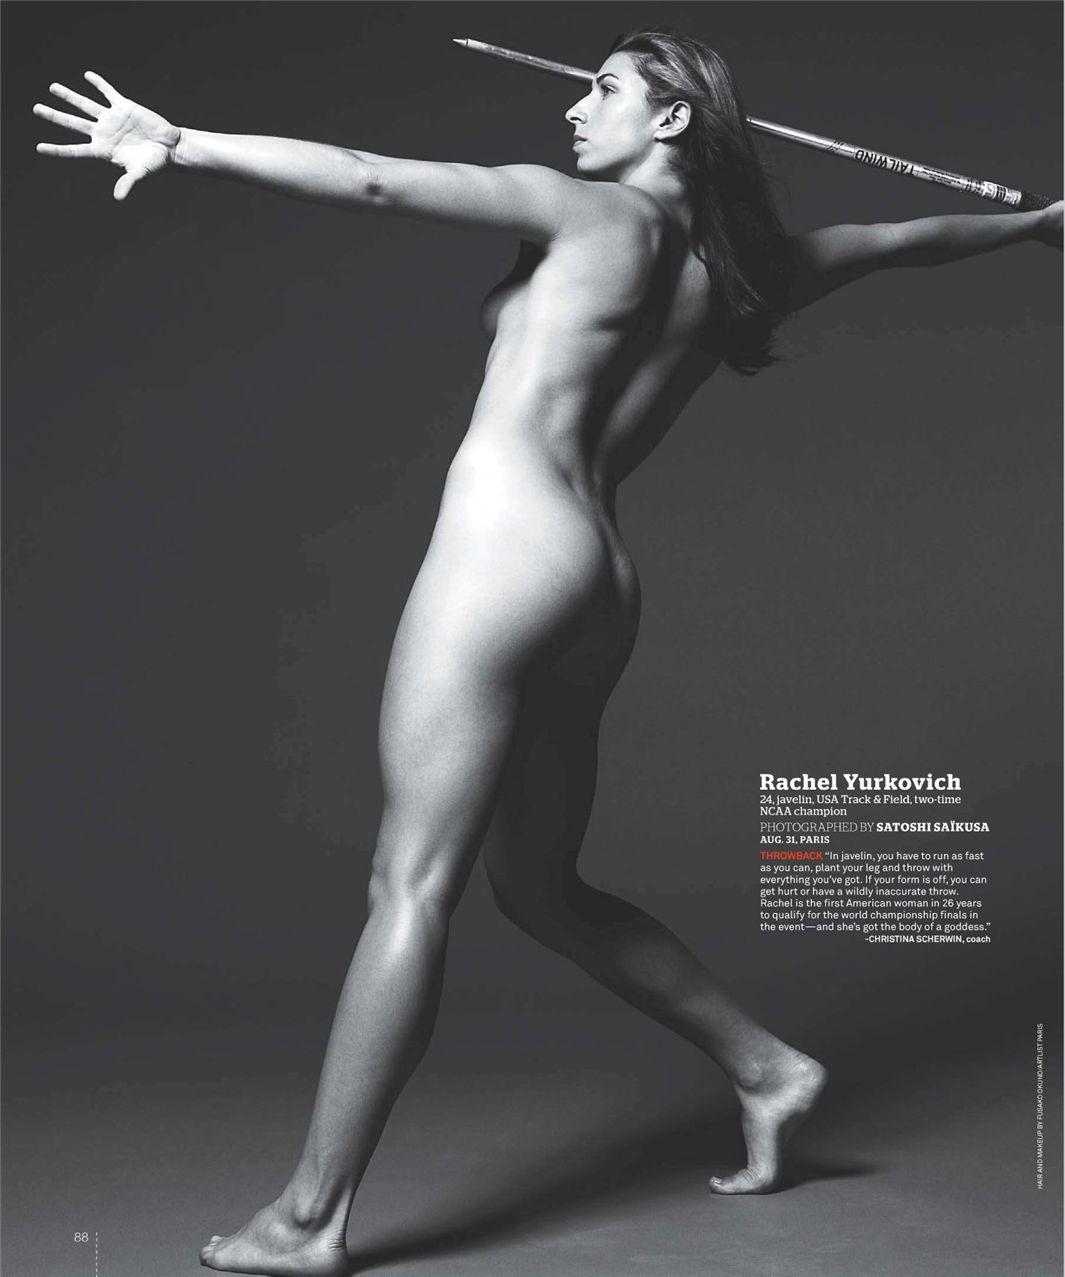 Рэйчел Юркович / Rachel Yurkovich - ESPN Magazine Body Issue 18 october 2010